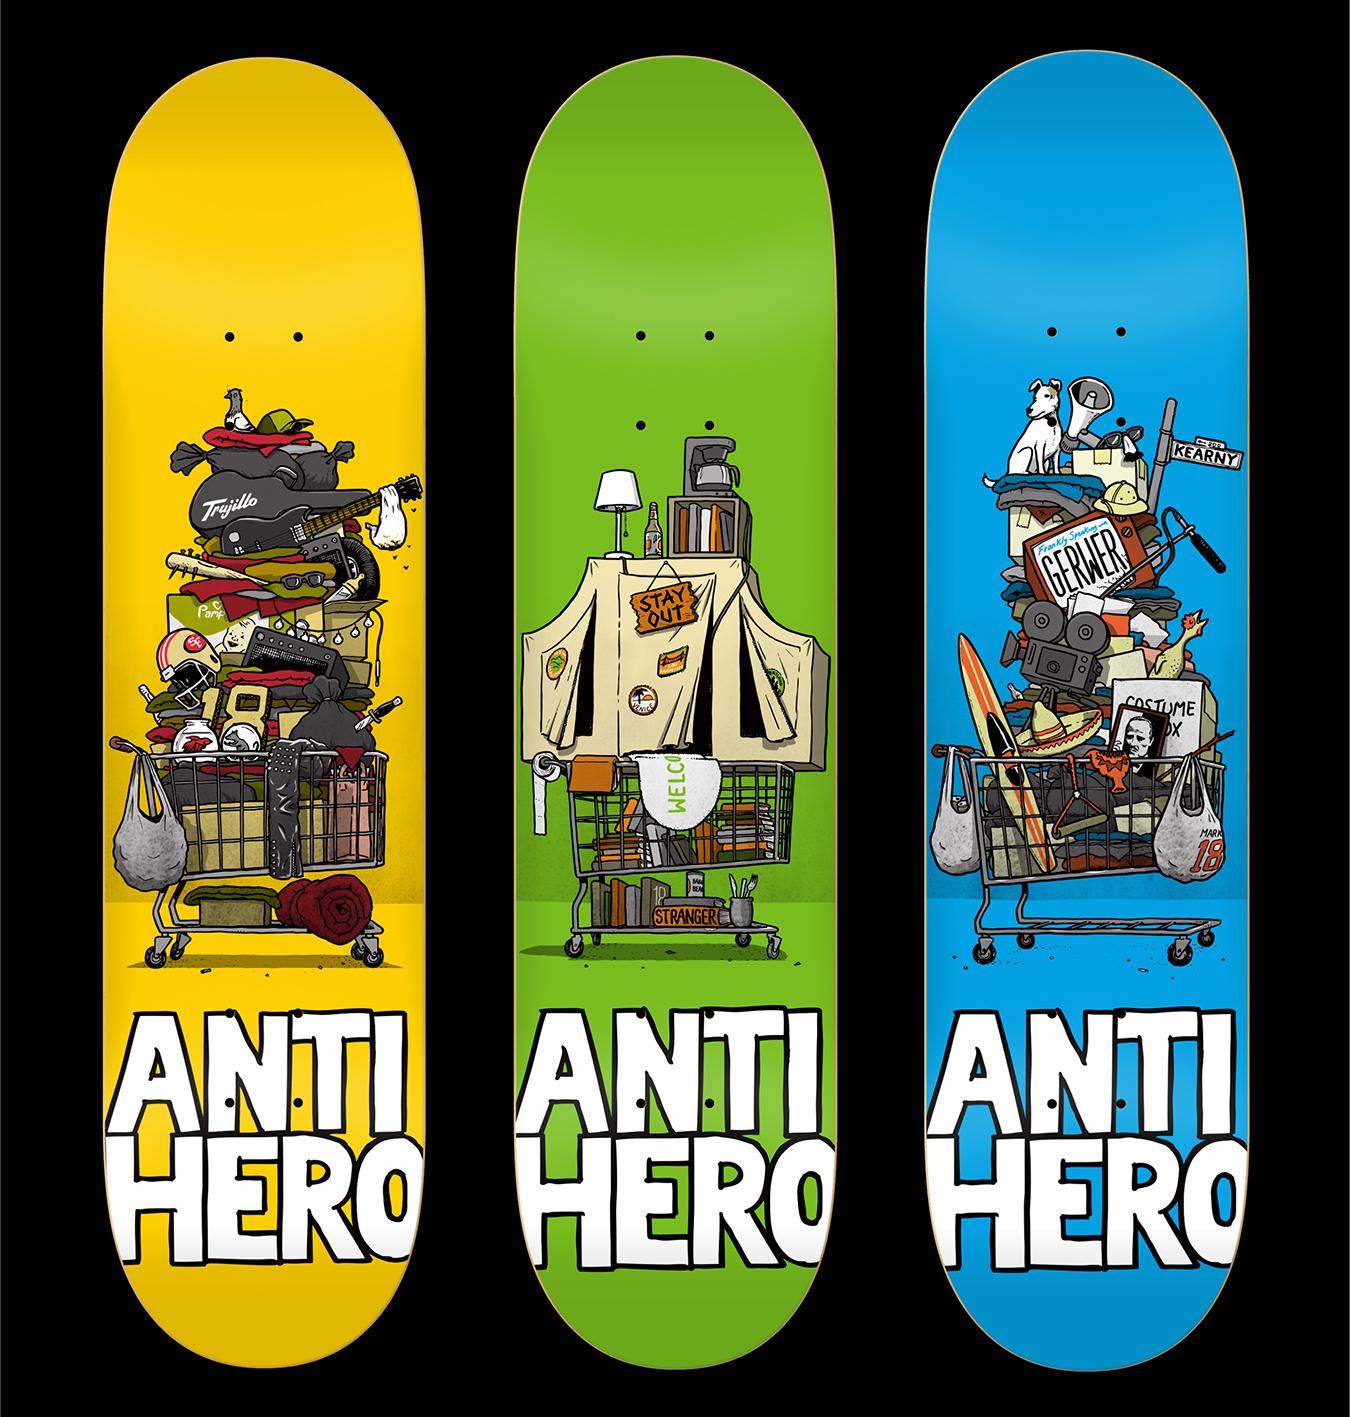 hoarder-heros